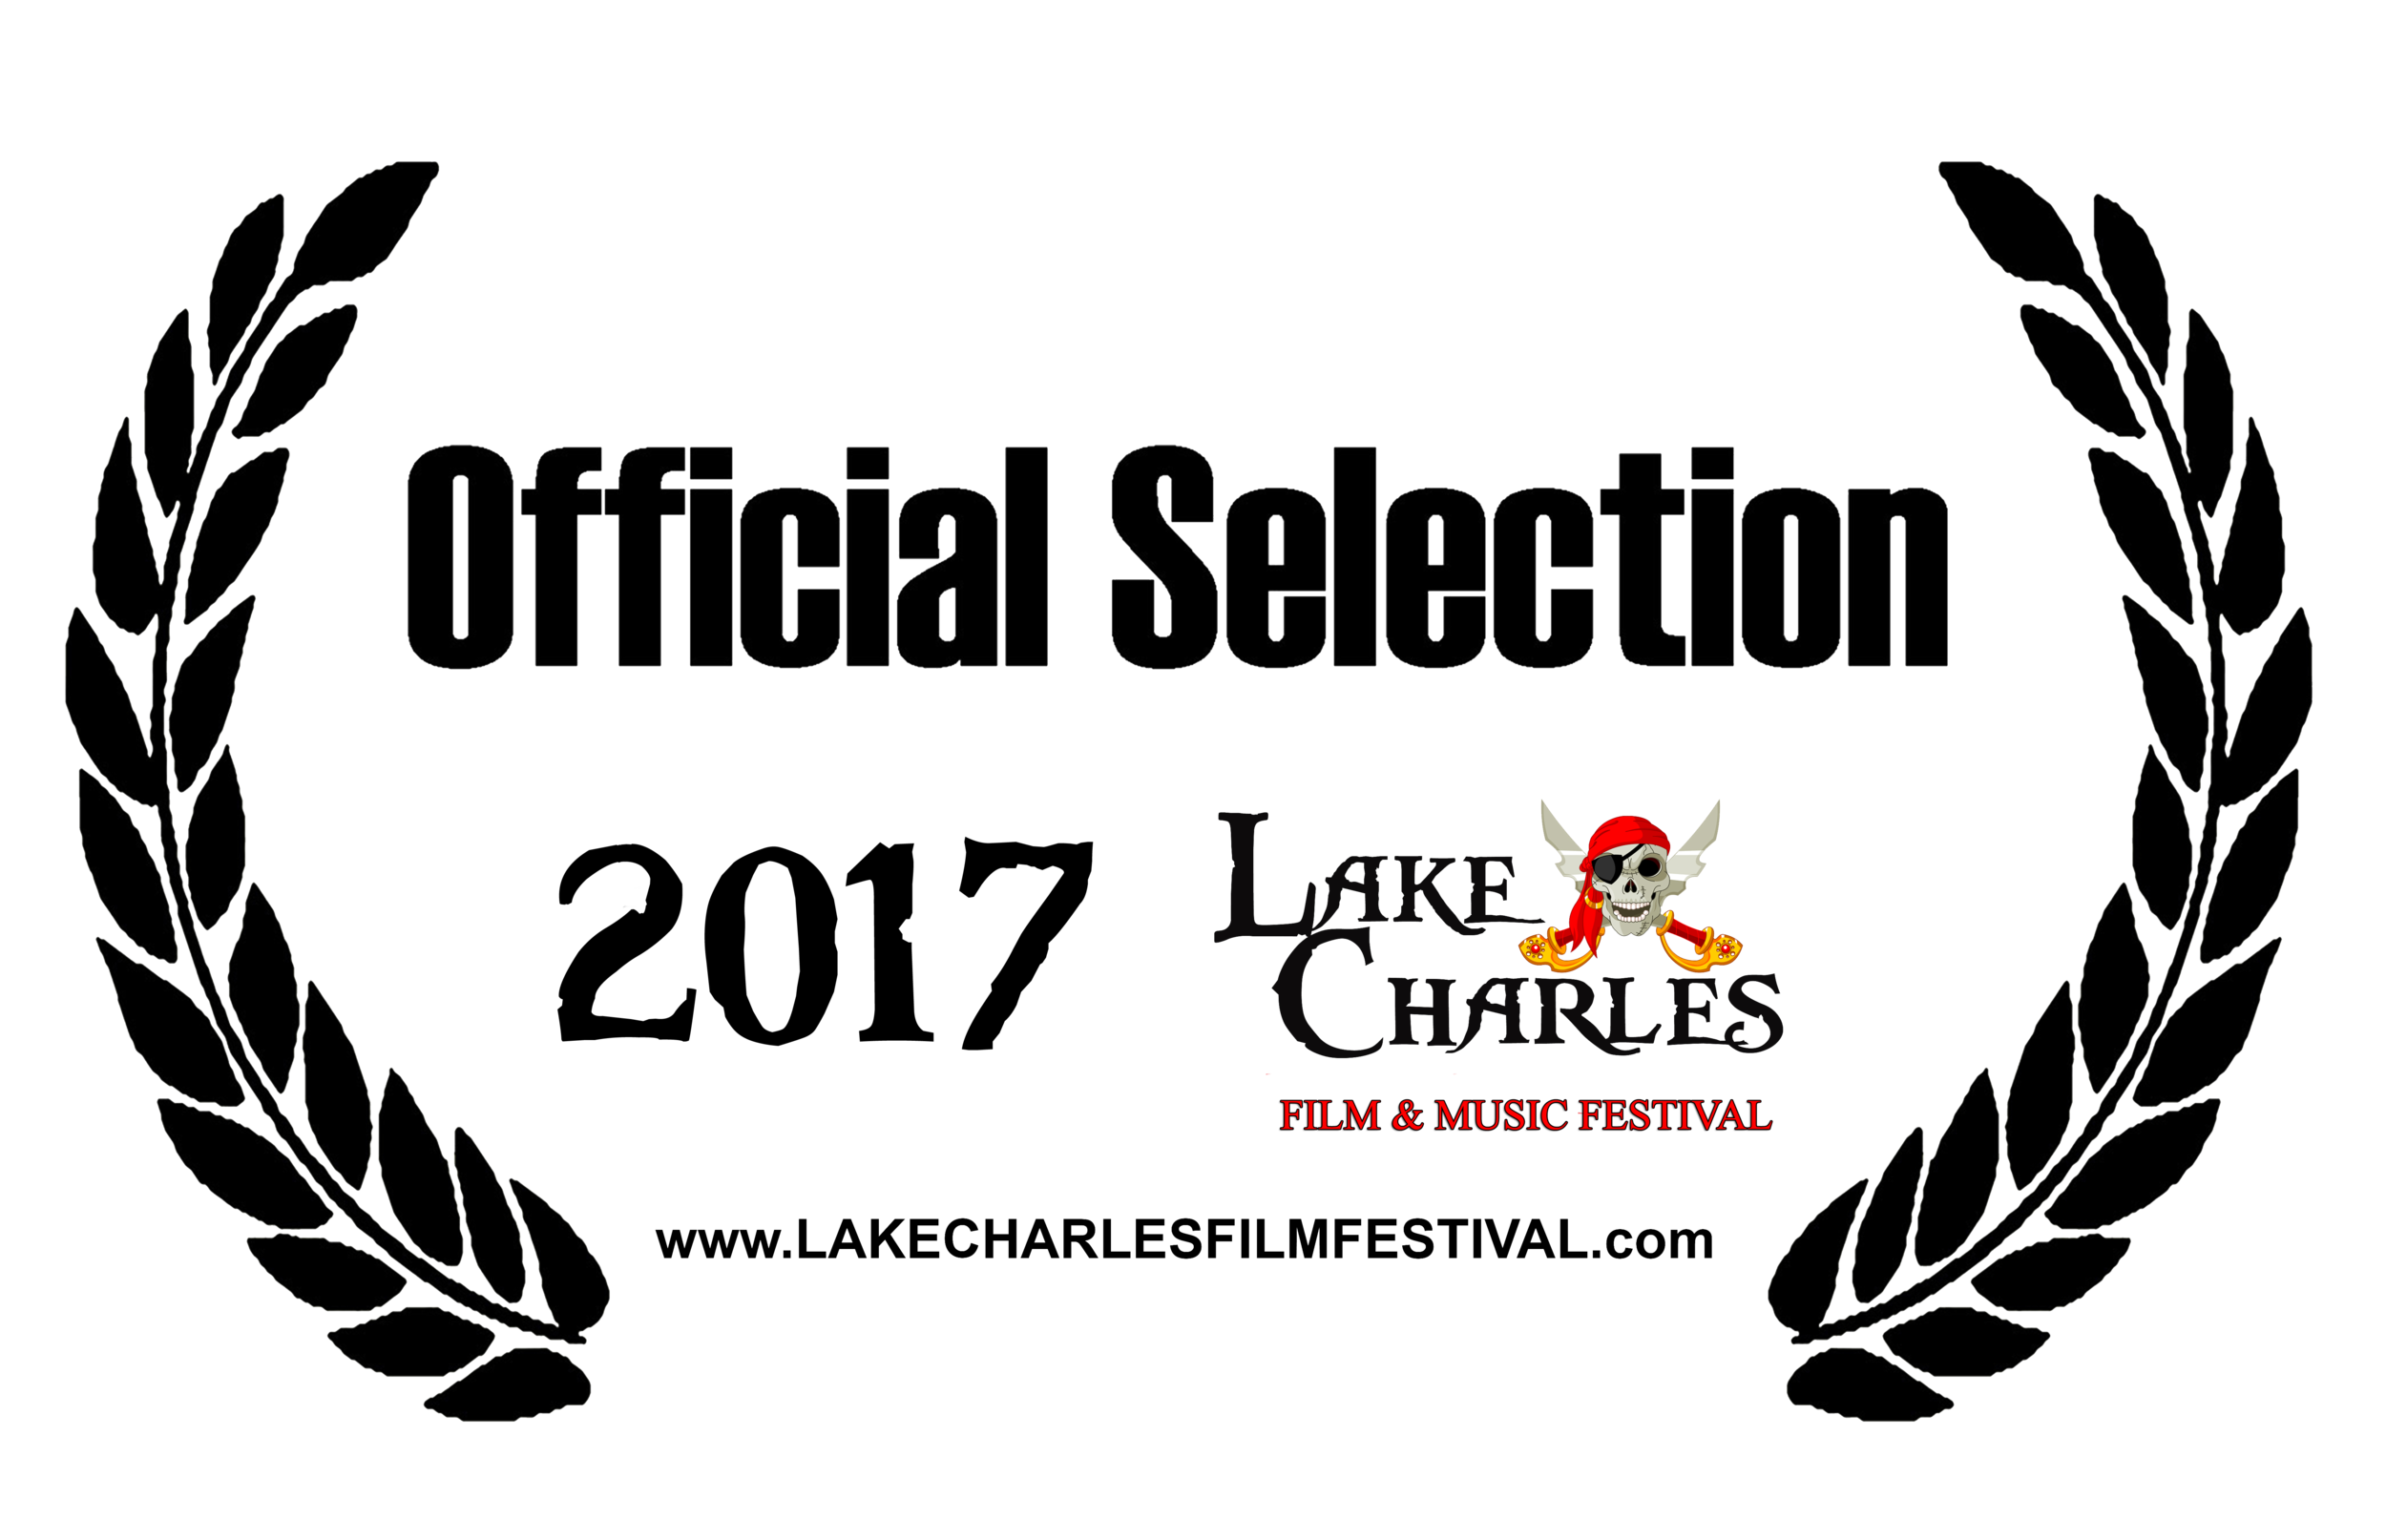 2017_OFFICIAL_SELECTION_LAURELS.png